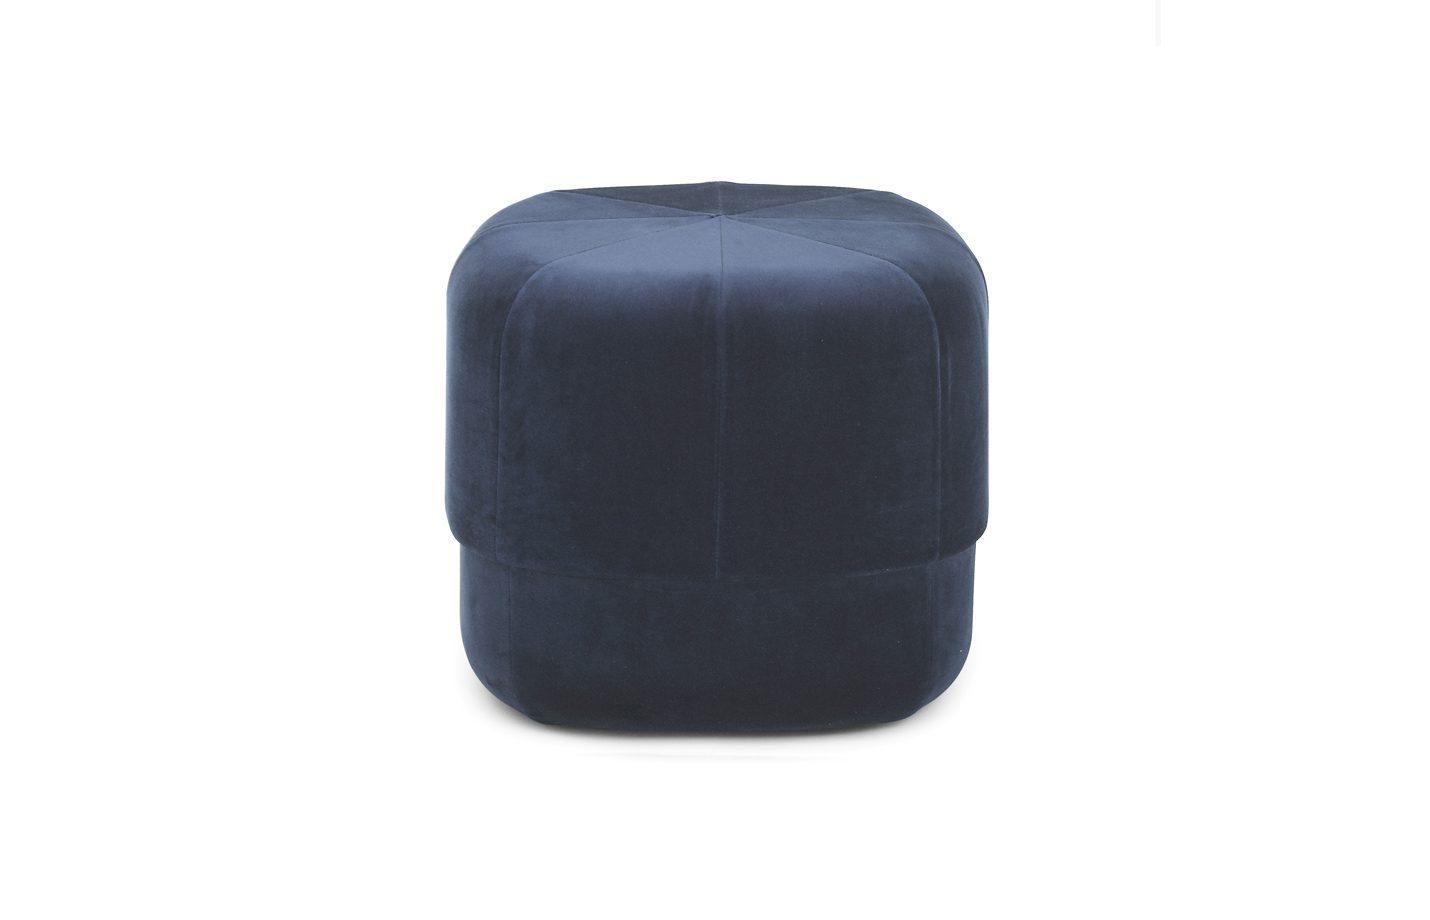 Circus-pouf-ottoman-small-dark-blue